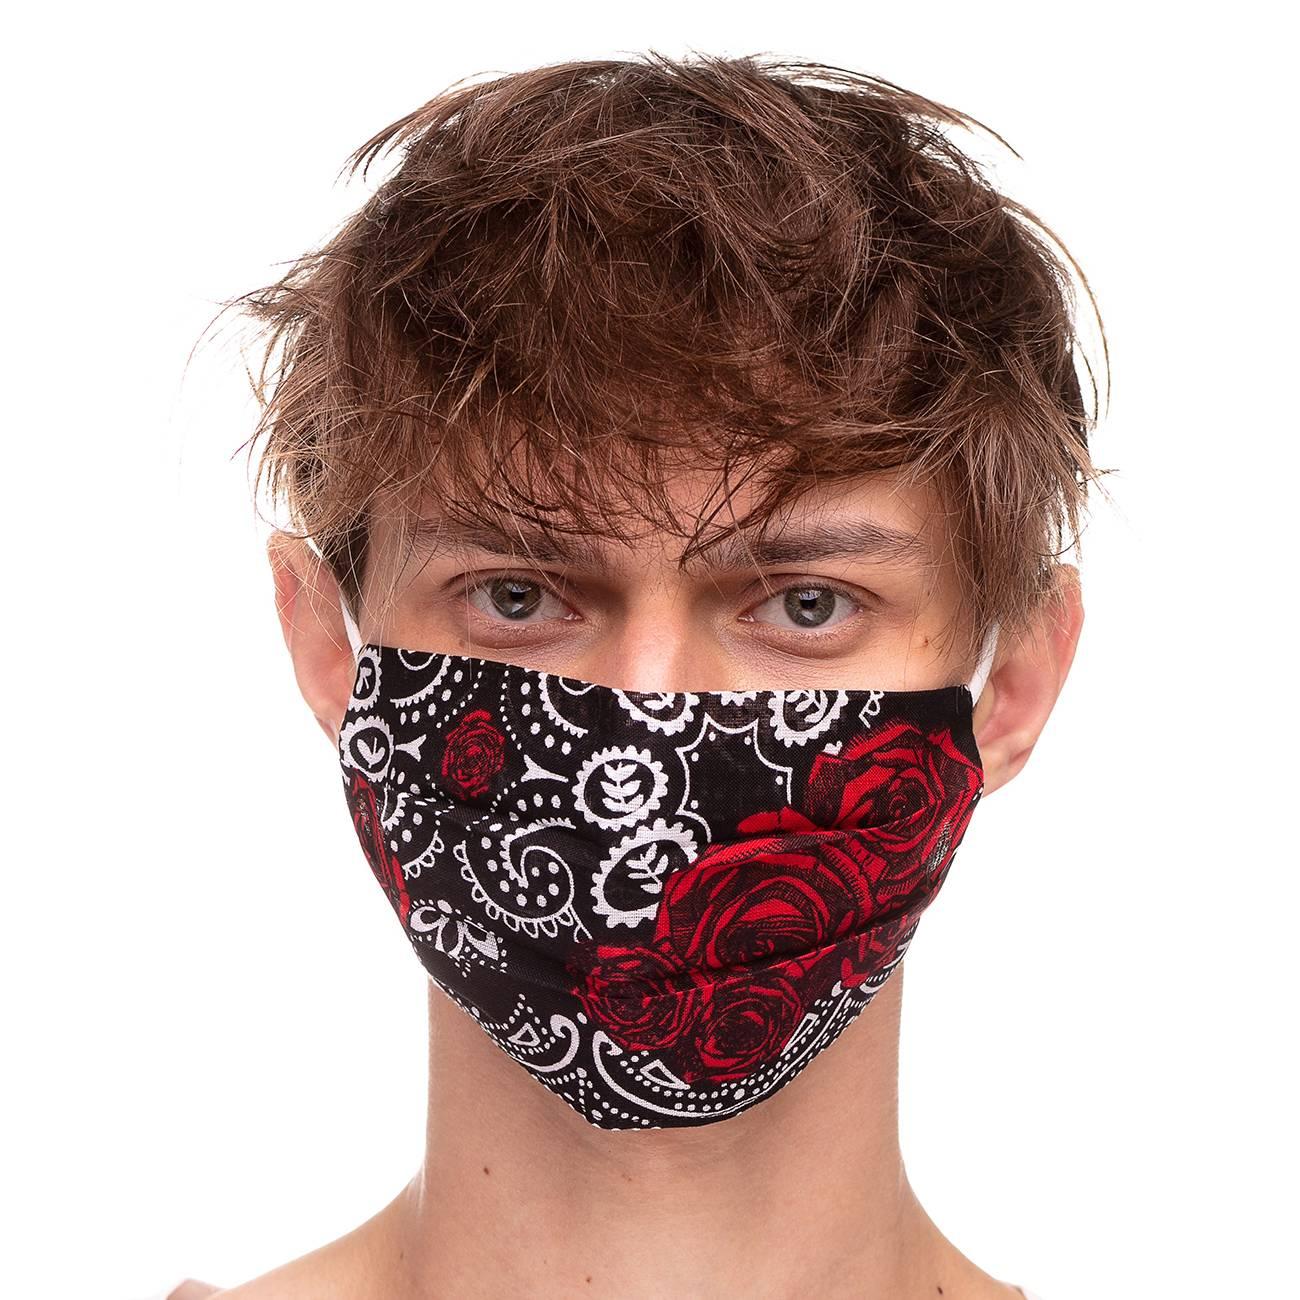 Masca Pm2.5 Trandafirii- Adult S Be Aware imagine 2021 bestvalue.eu